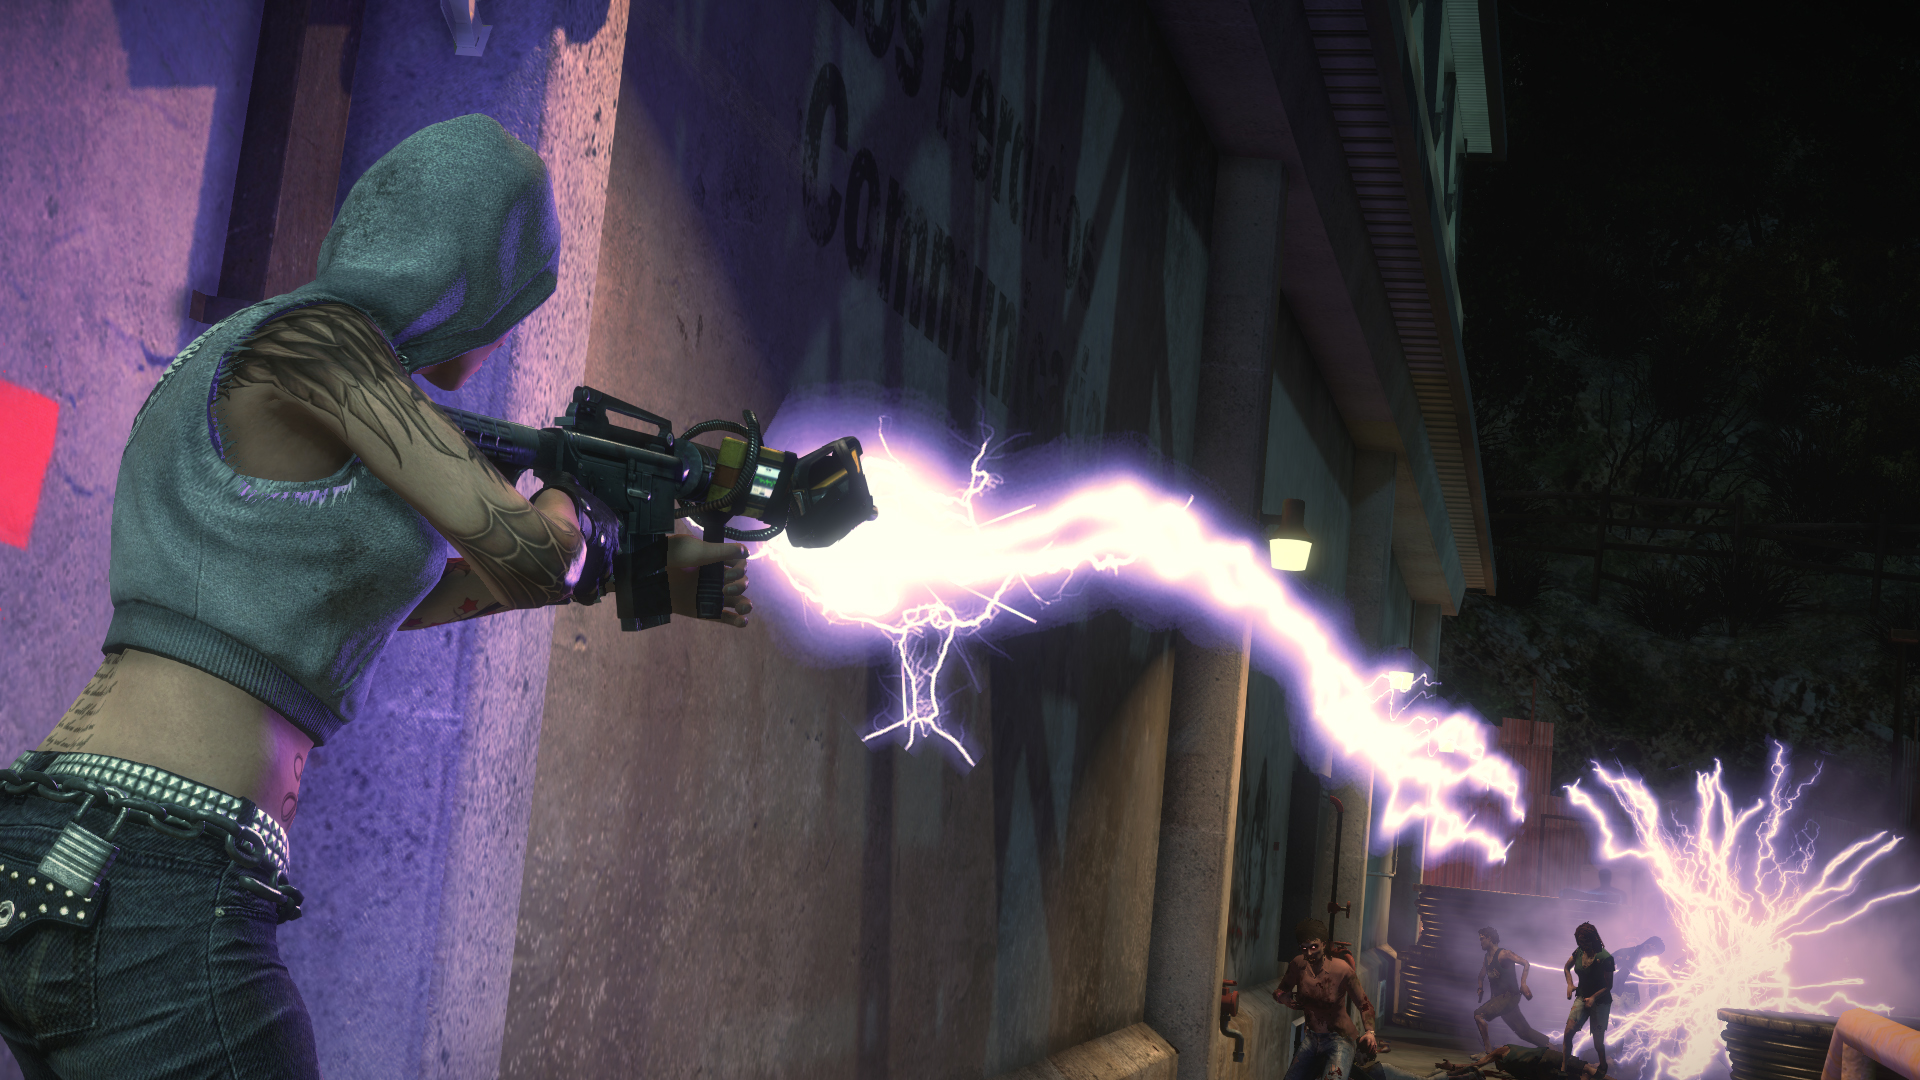 DeadRising3-FallenAngel Xbox One Editeur 008